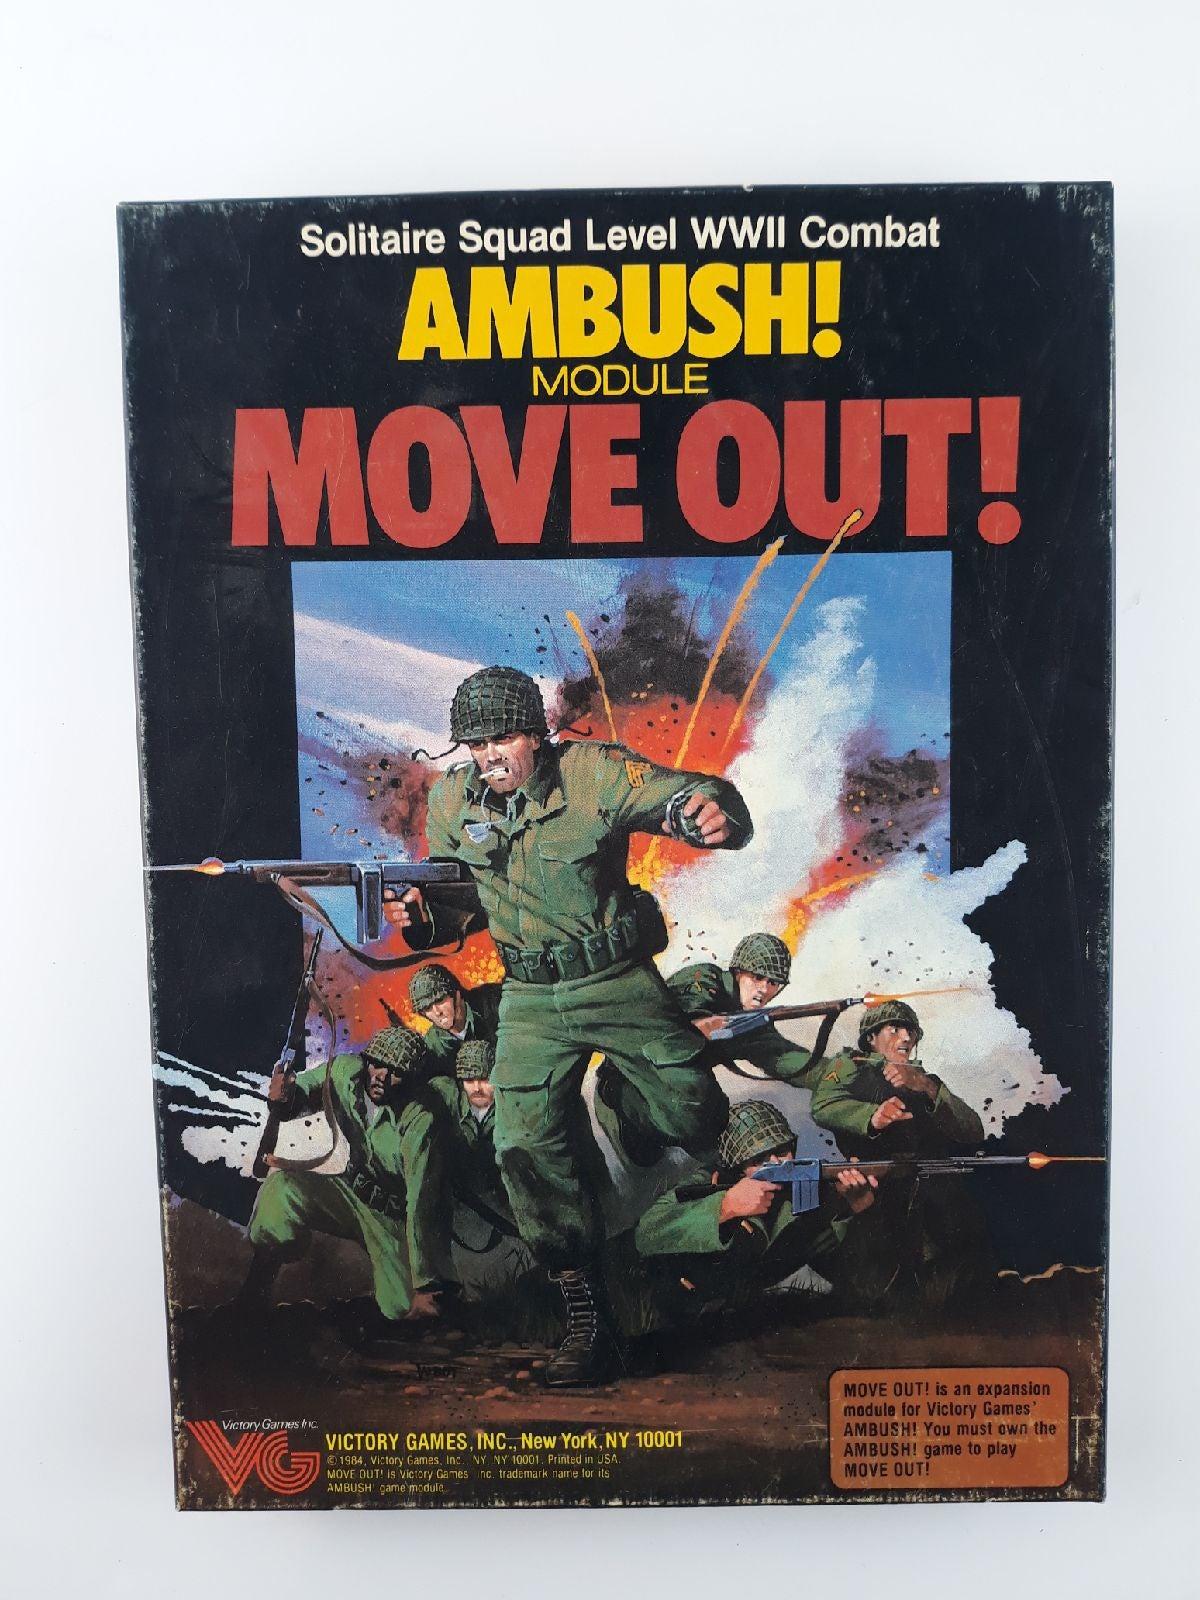 Ambush Module Move Out